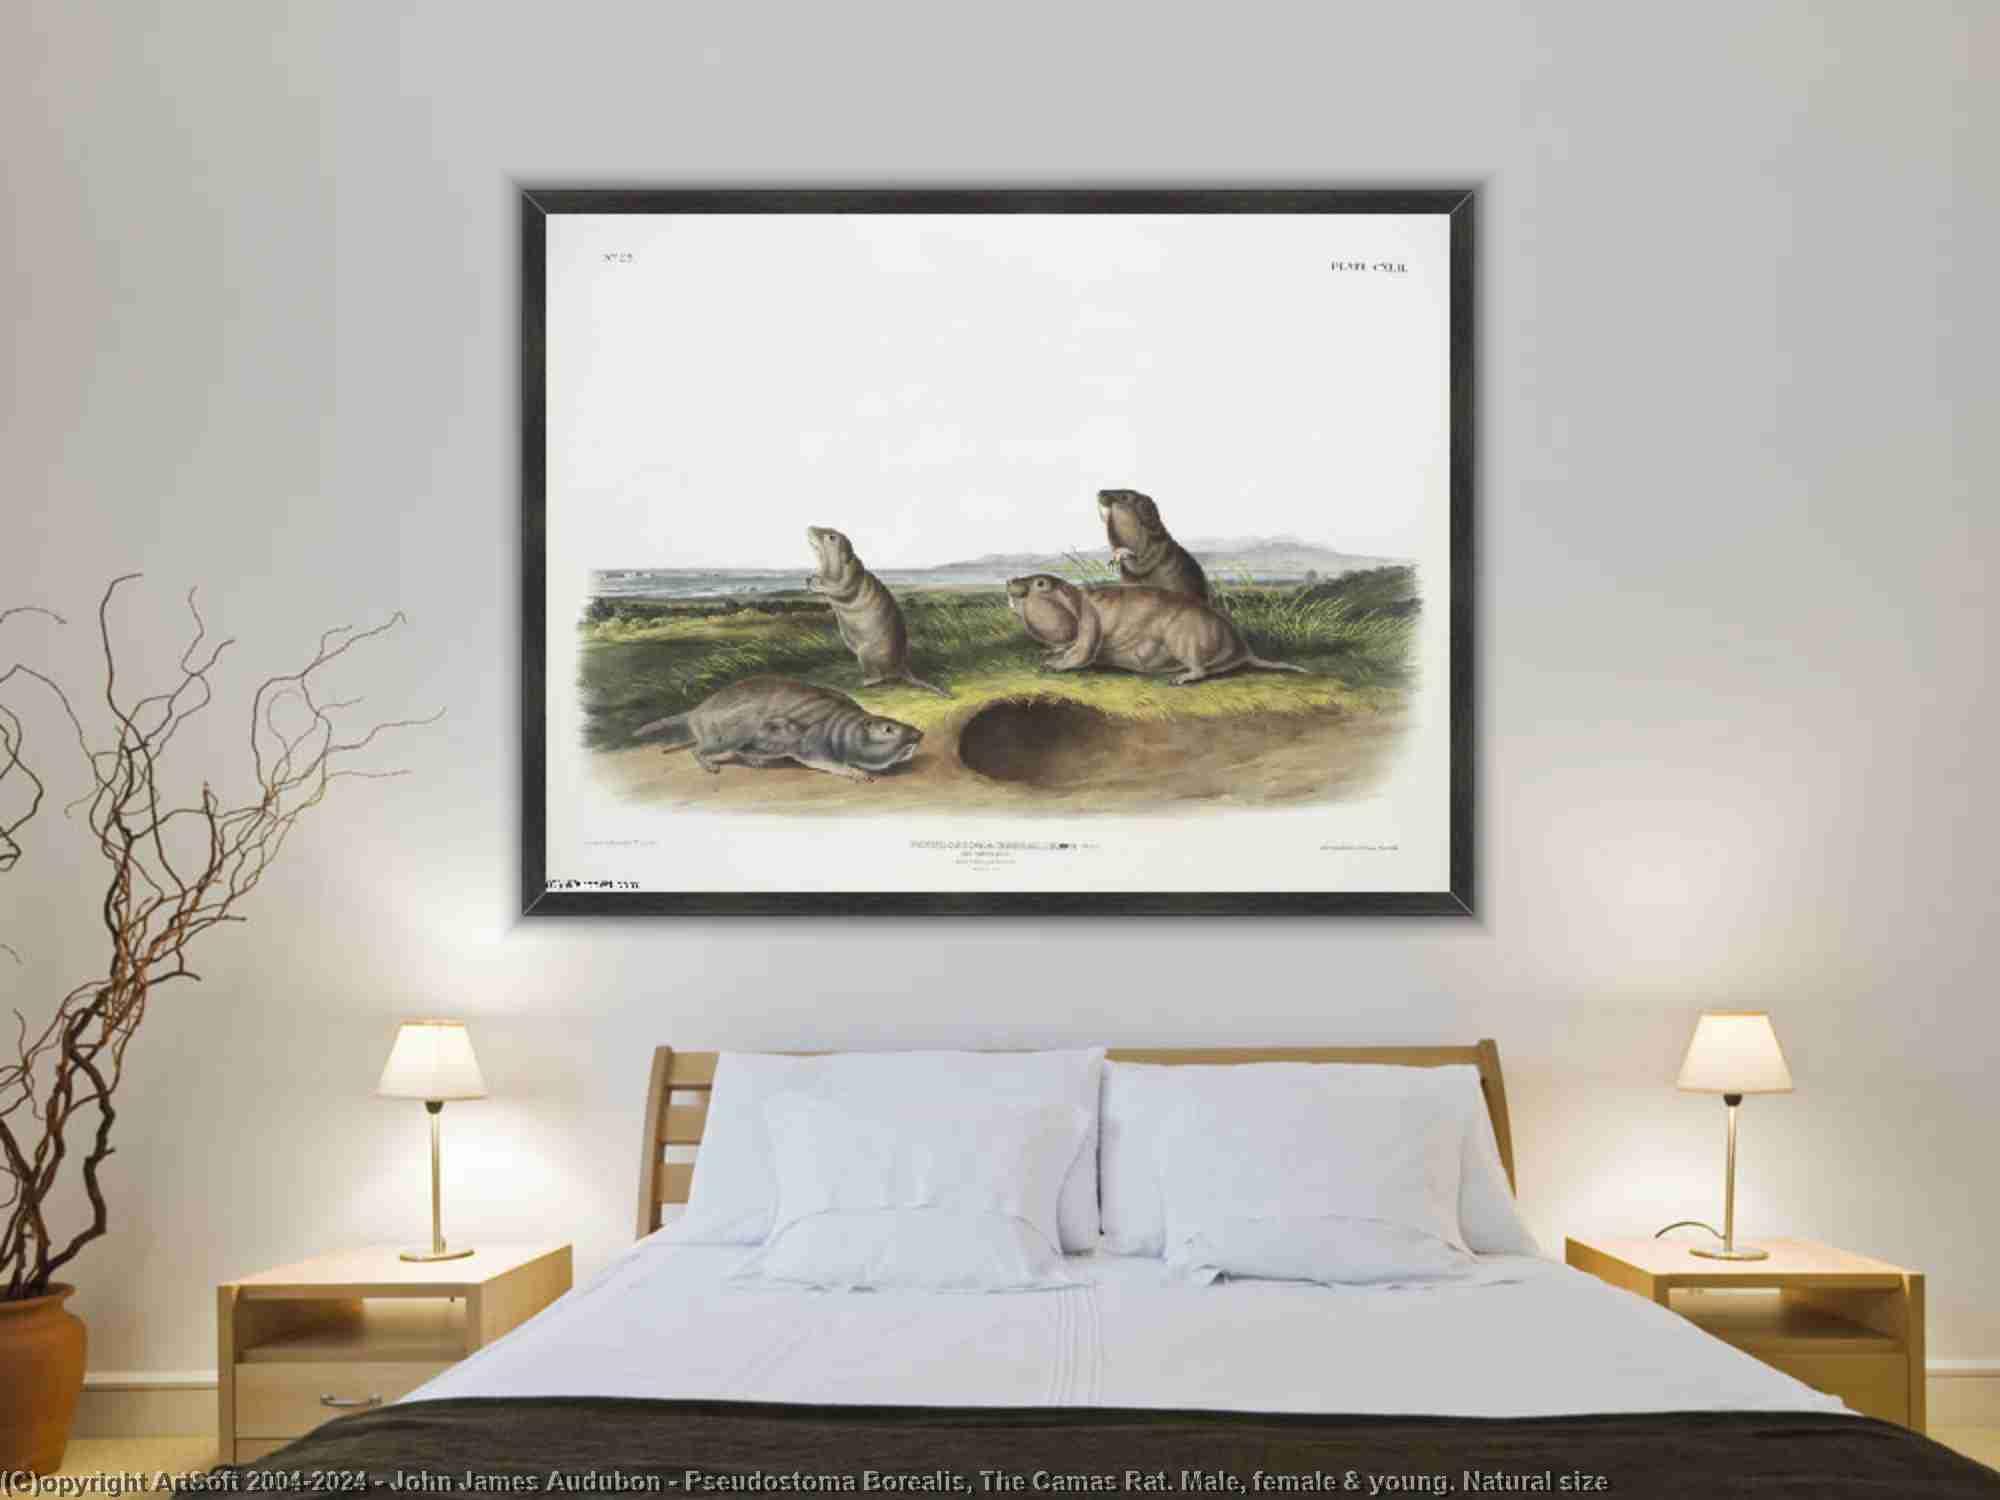 John James Audubon - pseudostoma borealis , la camas rat . Maschile , femmina - giovani . Grandezza naturale